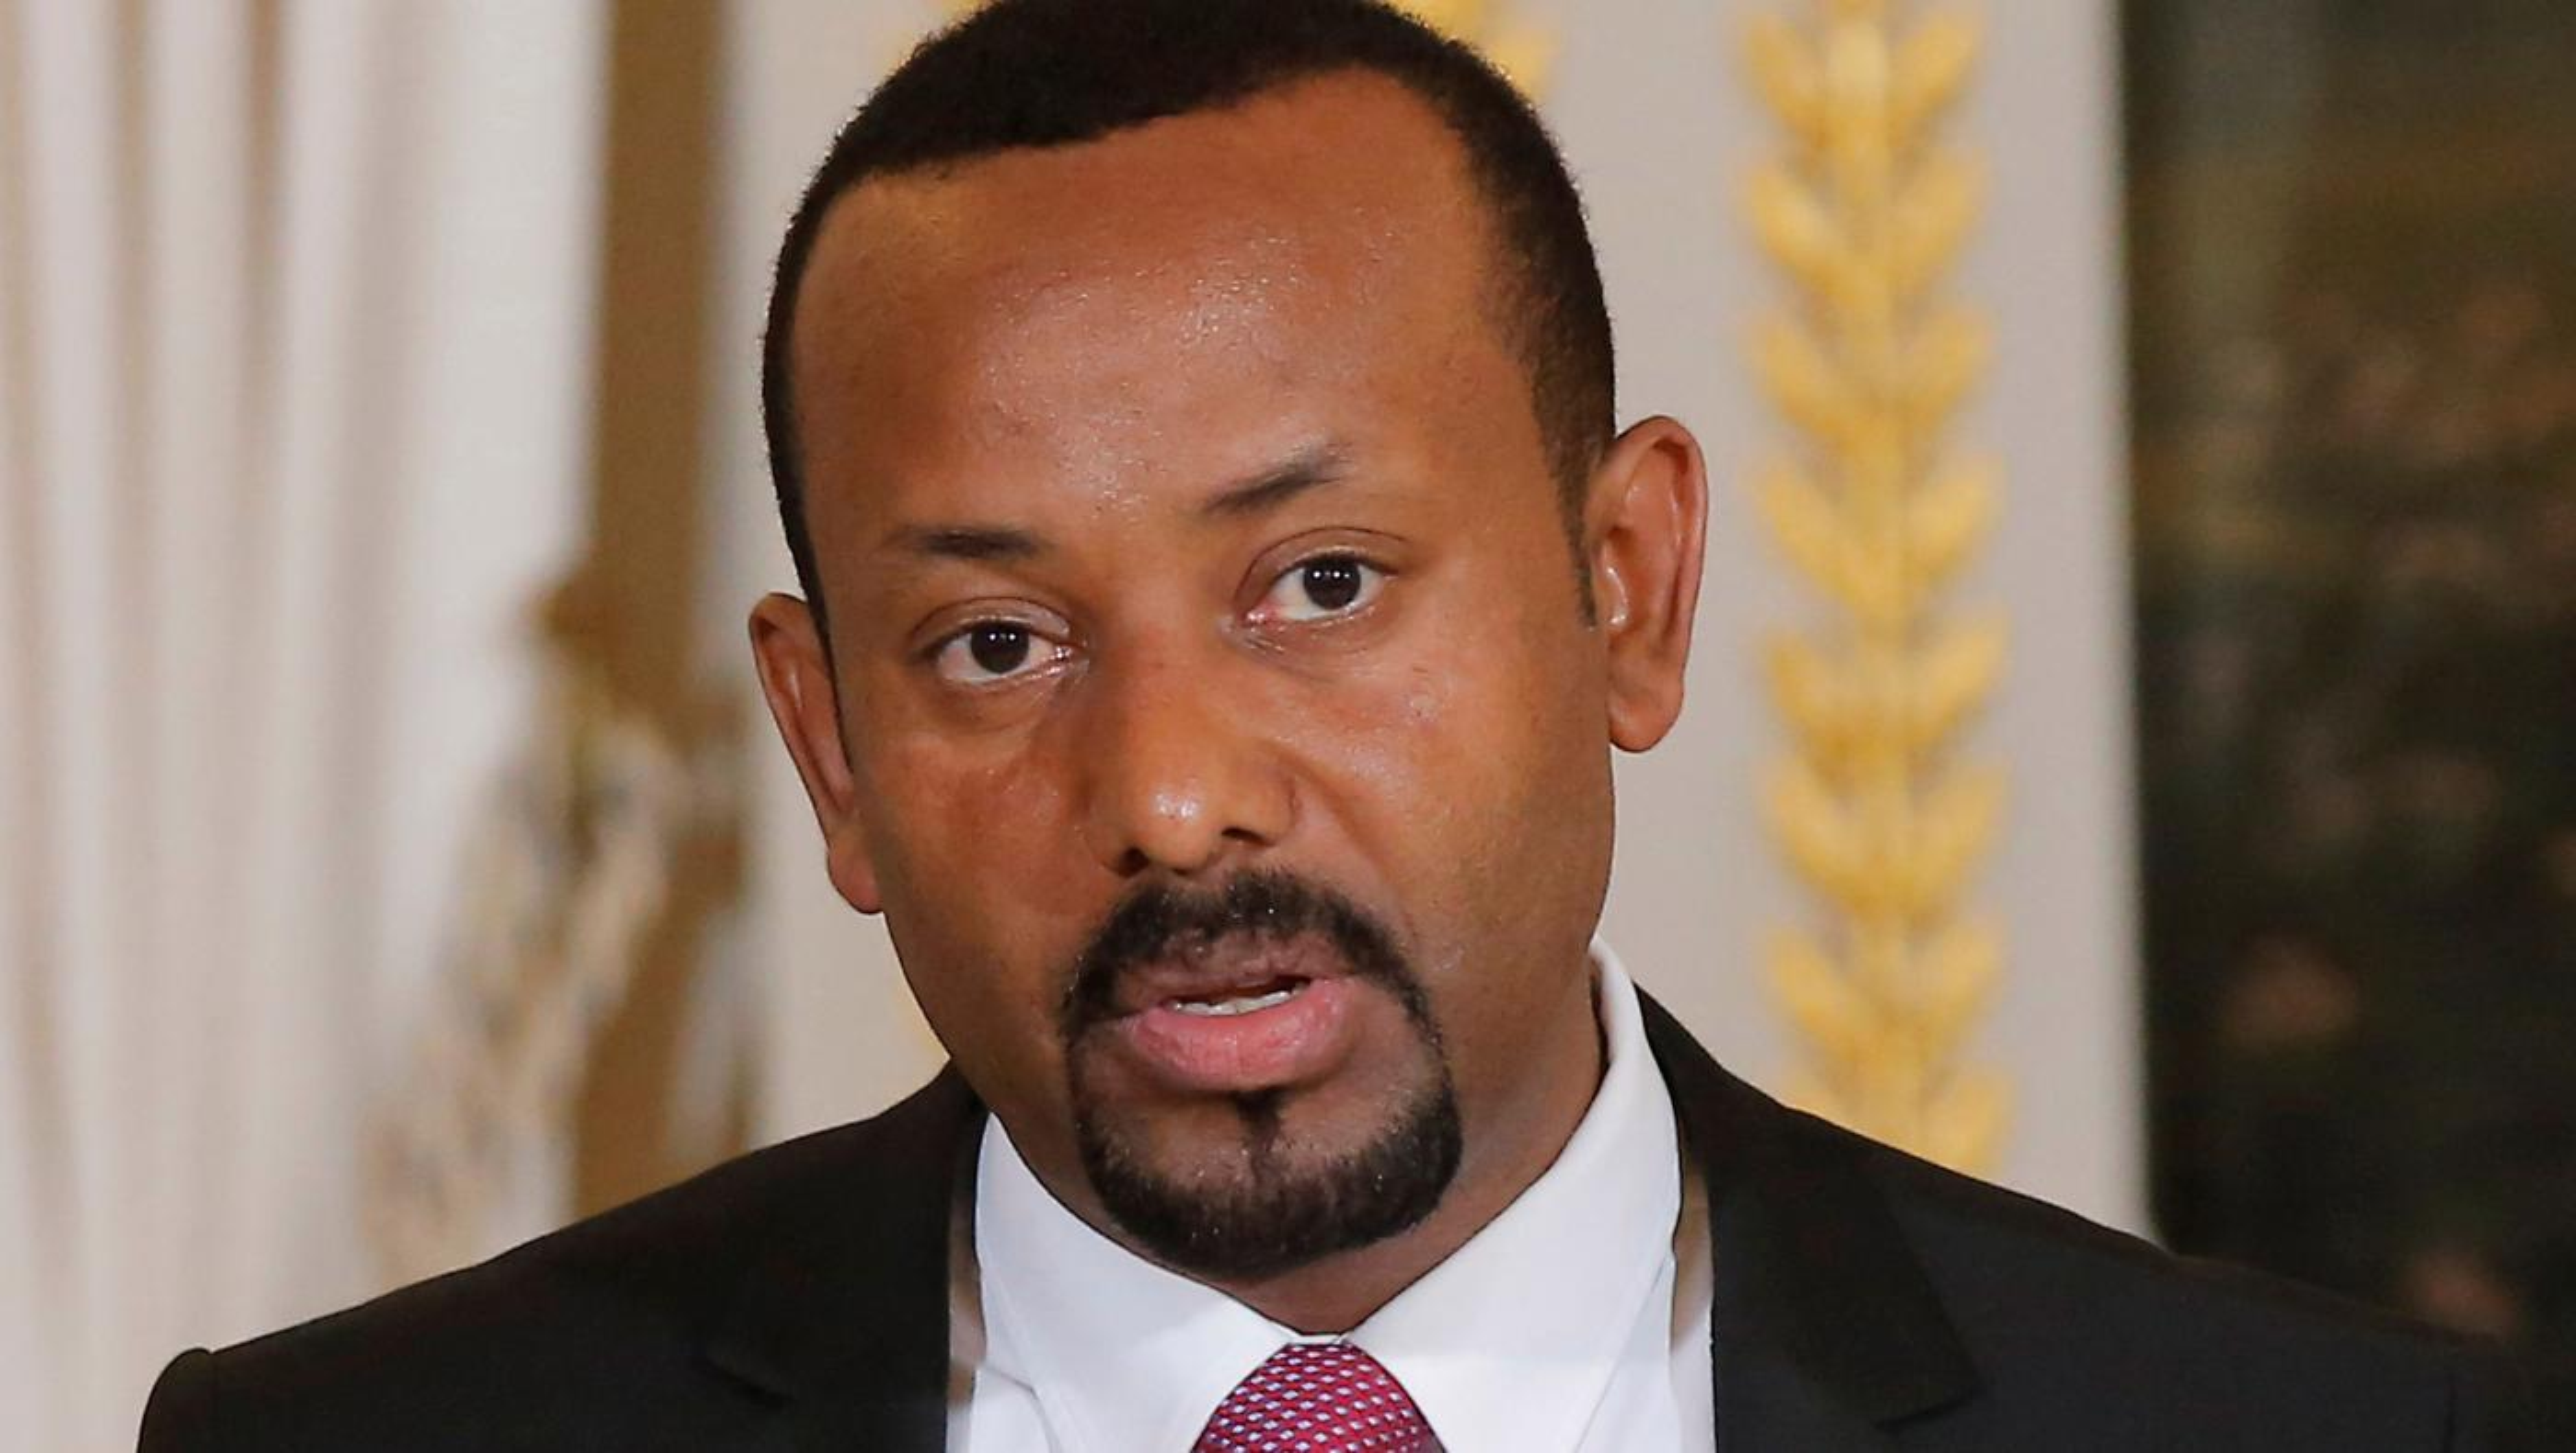 Ethiopia has postponed its national elections over coronavirus fears